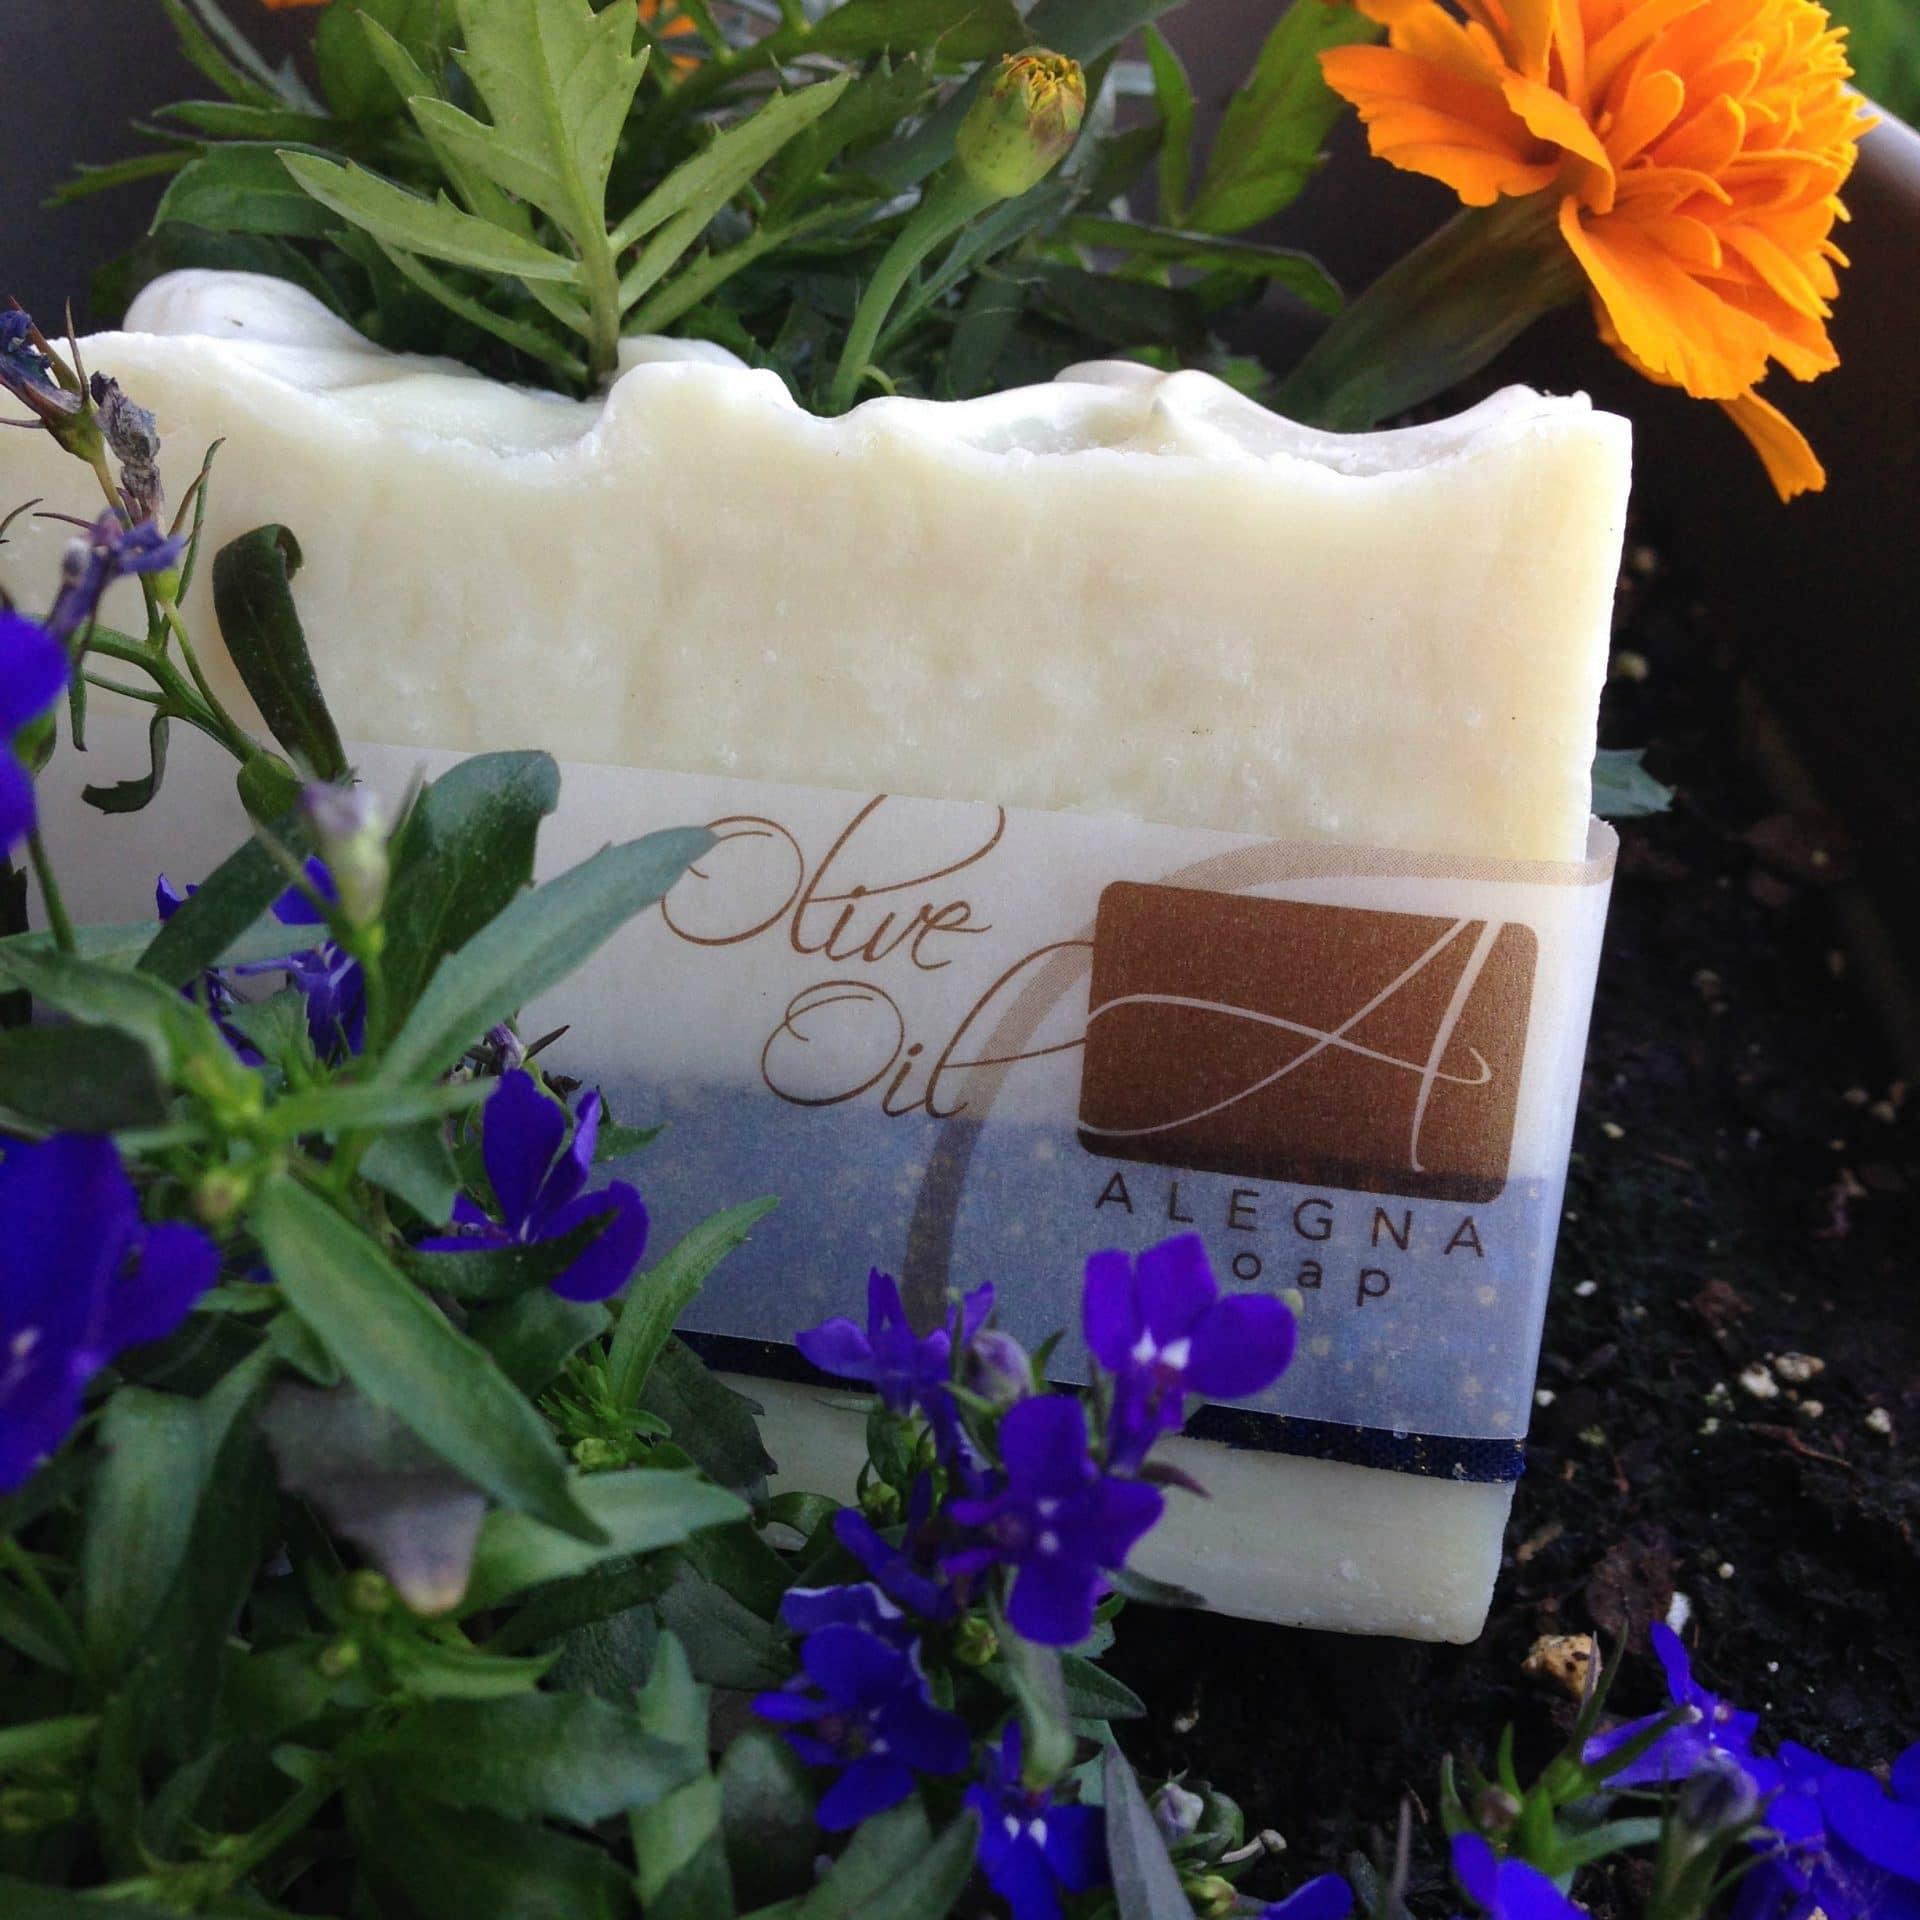 Alegna Soap® Olive Oil Soap